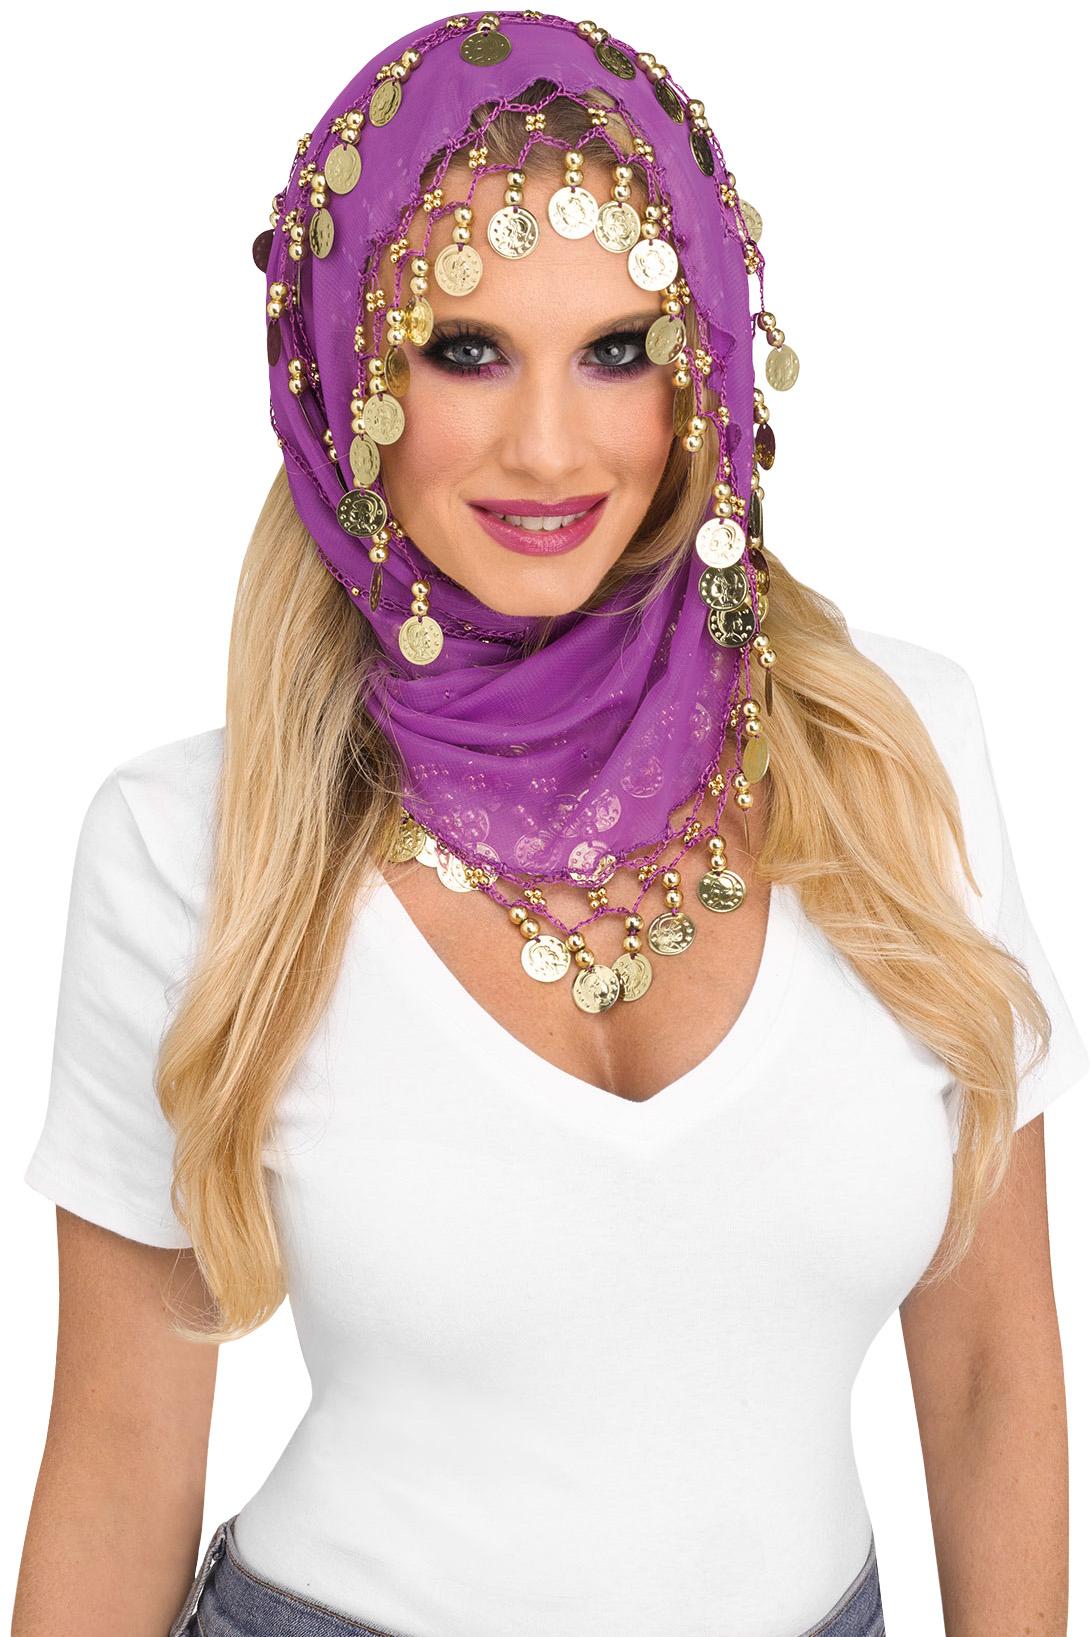 thumbnail 3 - Women-Bohemian-Head-Scarf-Belly-Dancer-Skirt-Wrap-Gold-Coins-Halloween-Costume